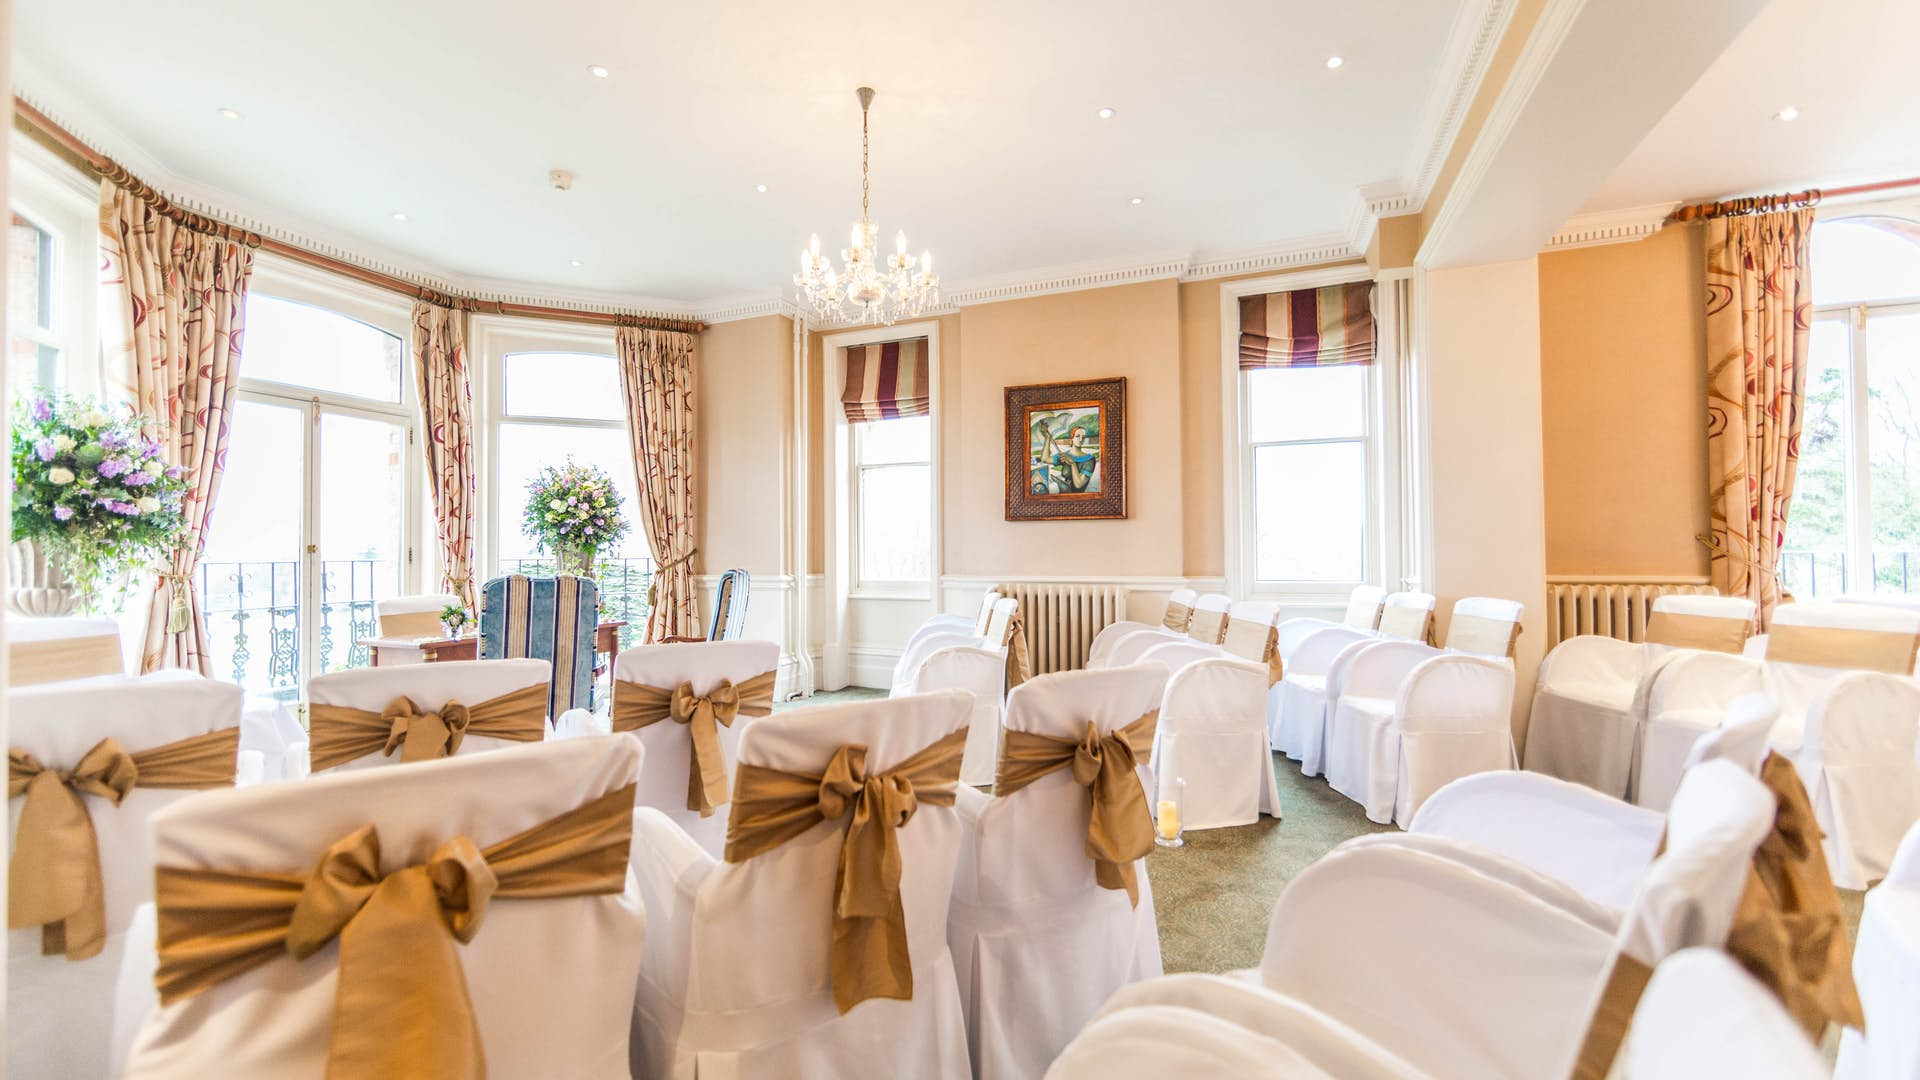 Hire E Venue River Room At The Petersham Hotel